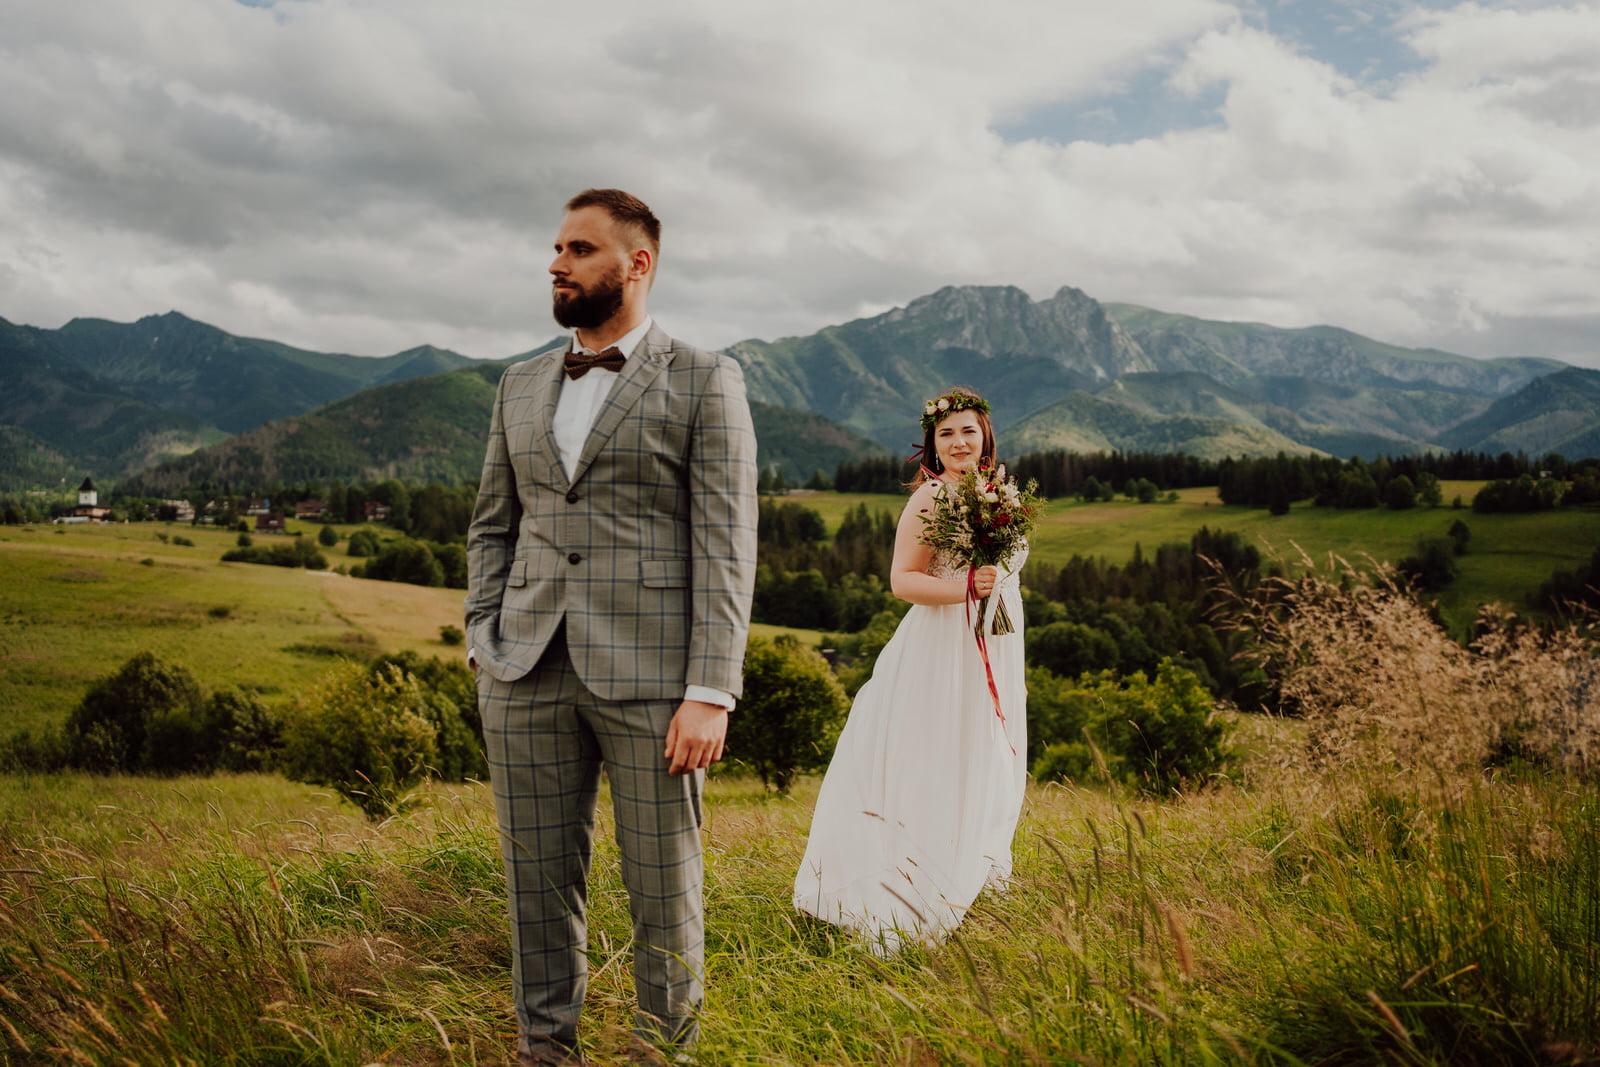 fotograf na ślub zakopane206